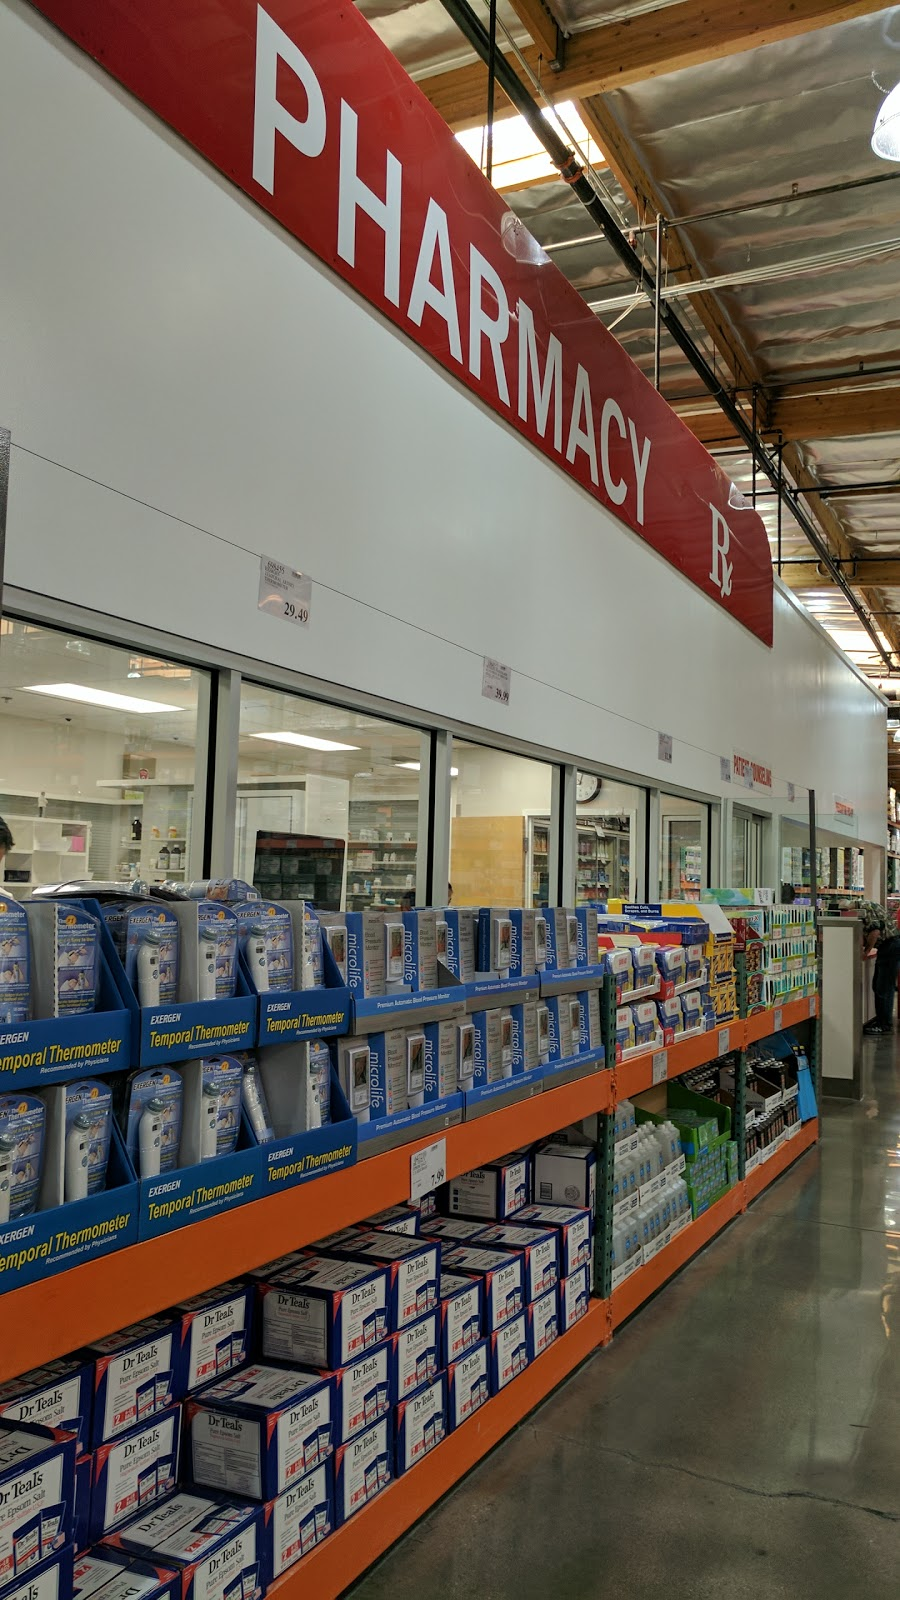 Costco Pharmacy - pharmacy    Photo 1 of 1   Address: 2200 E Willow St, Signal Hill, CA 90755, USA   Phone: (562) 427-2537